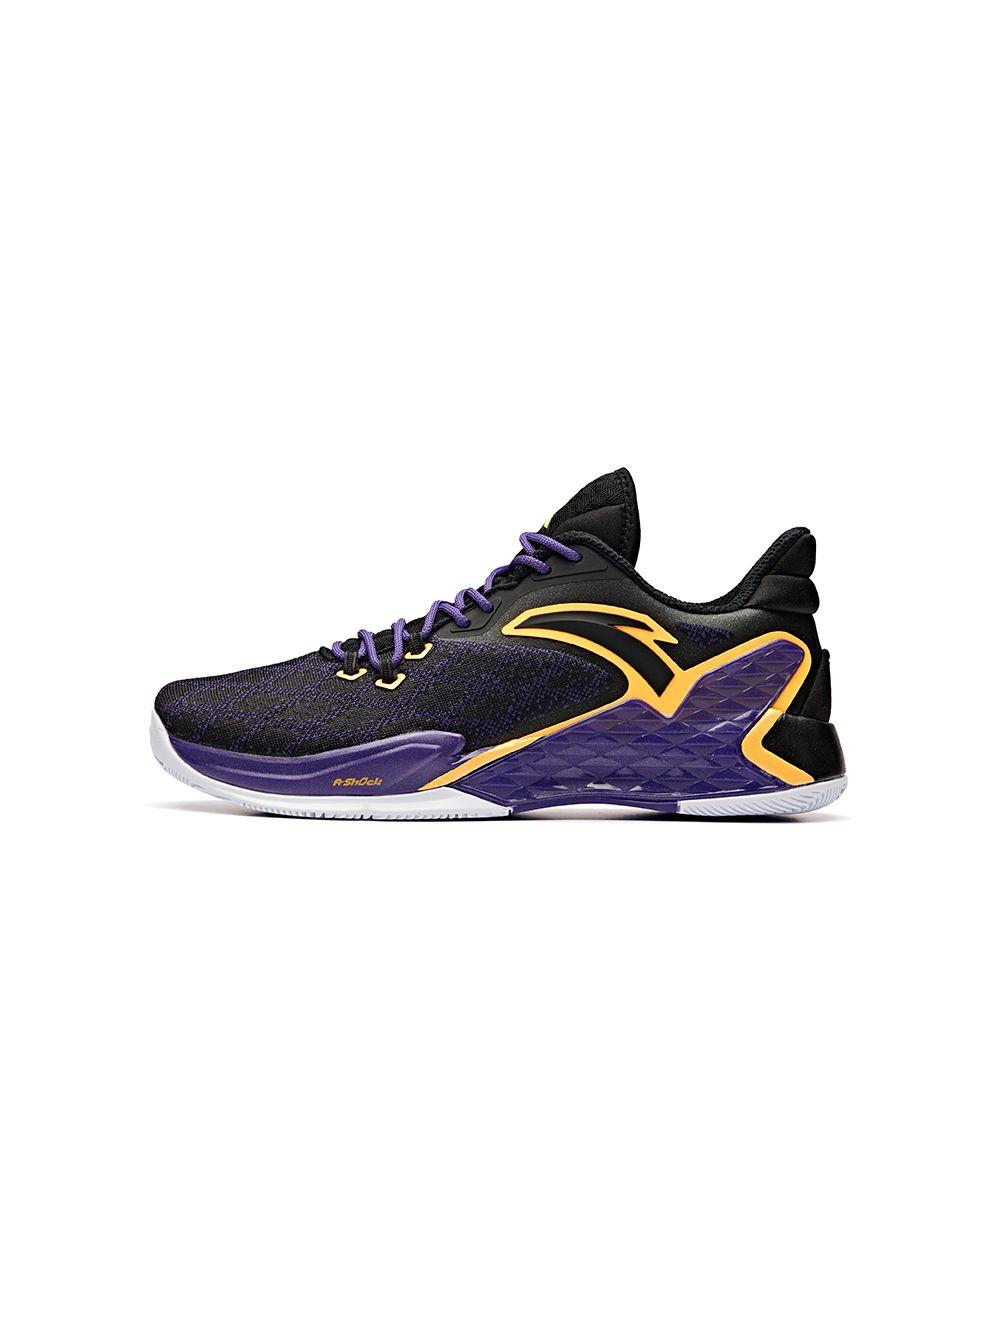 Los Angeles Lakers\